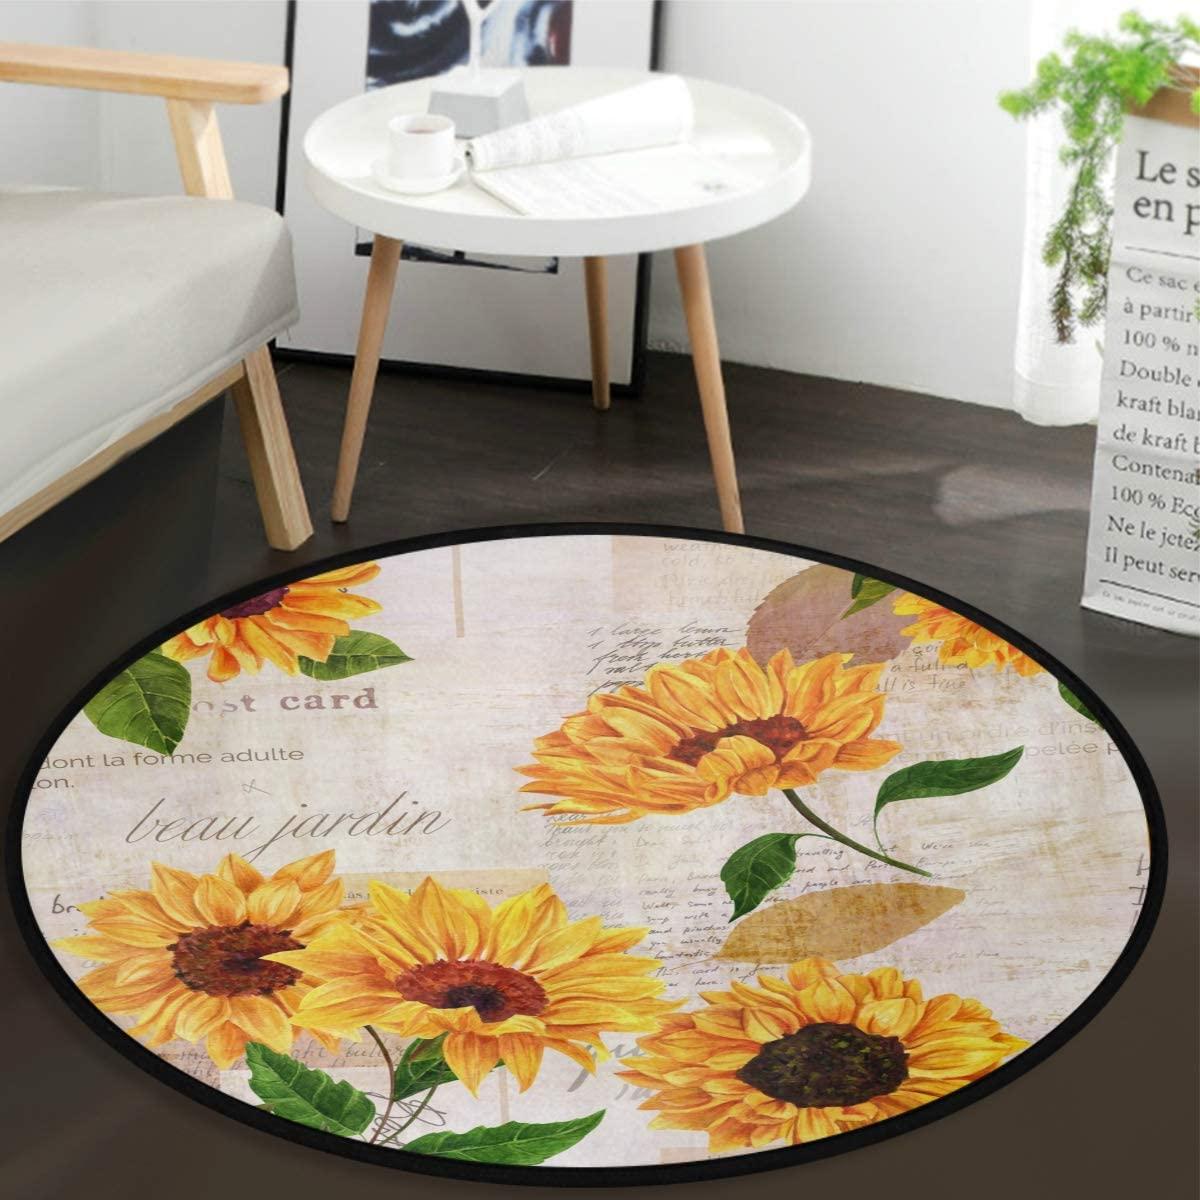 Vdsrup Yellow Sunflowers Floor Mat Autumn Sunflower Poppy Doormat Round Washable Non-Slip Indoor Carpet for Living Room Dining Bedroom Home 36